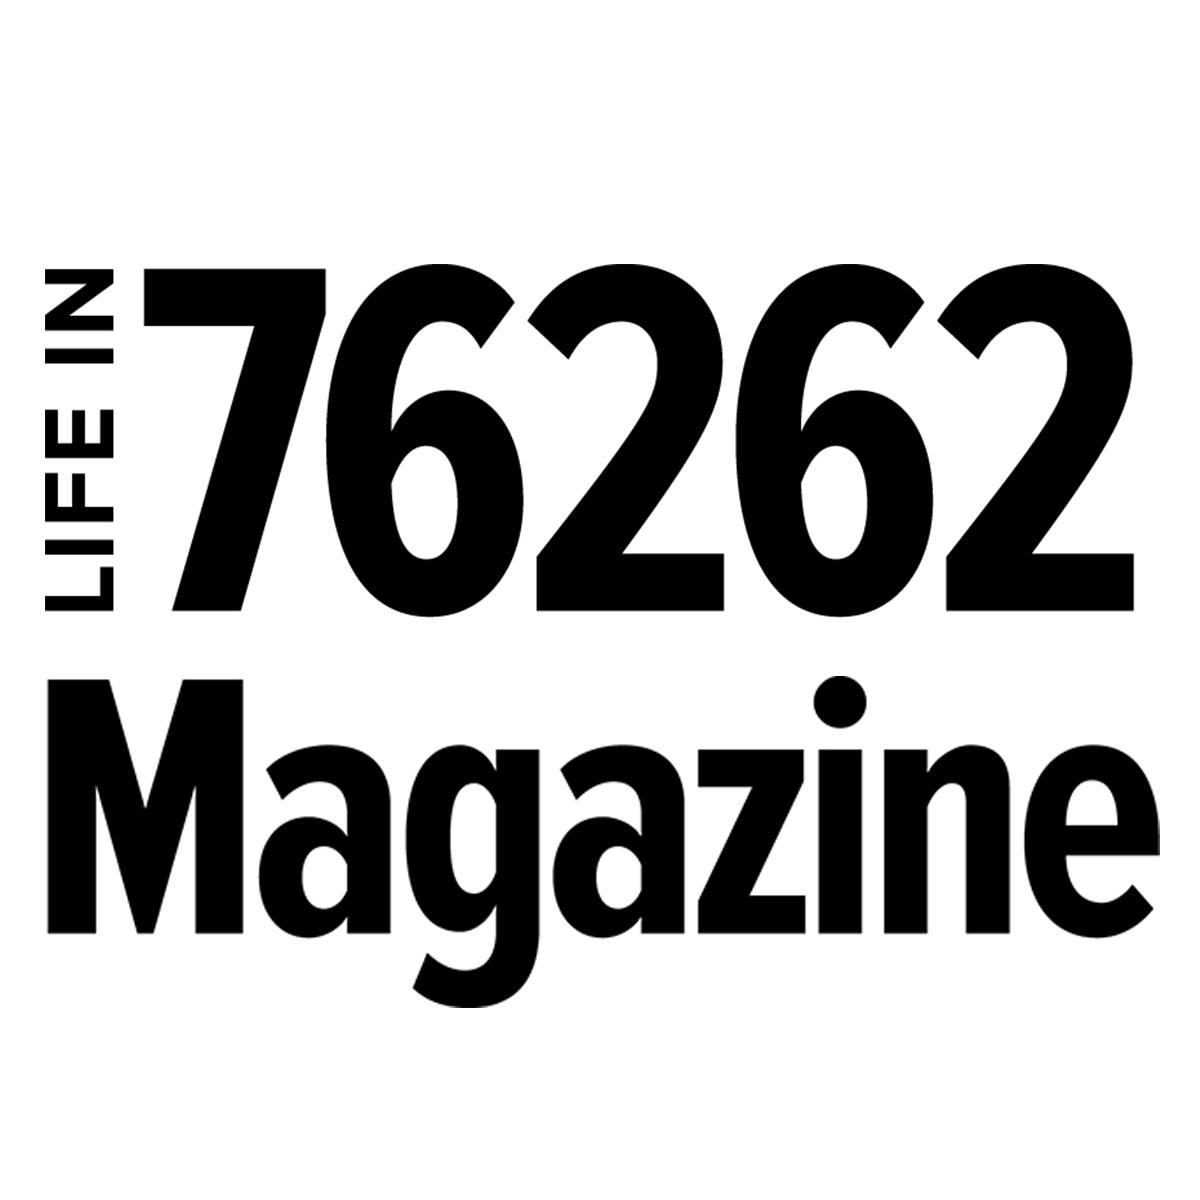 76262 Magazine